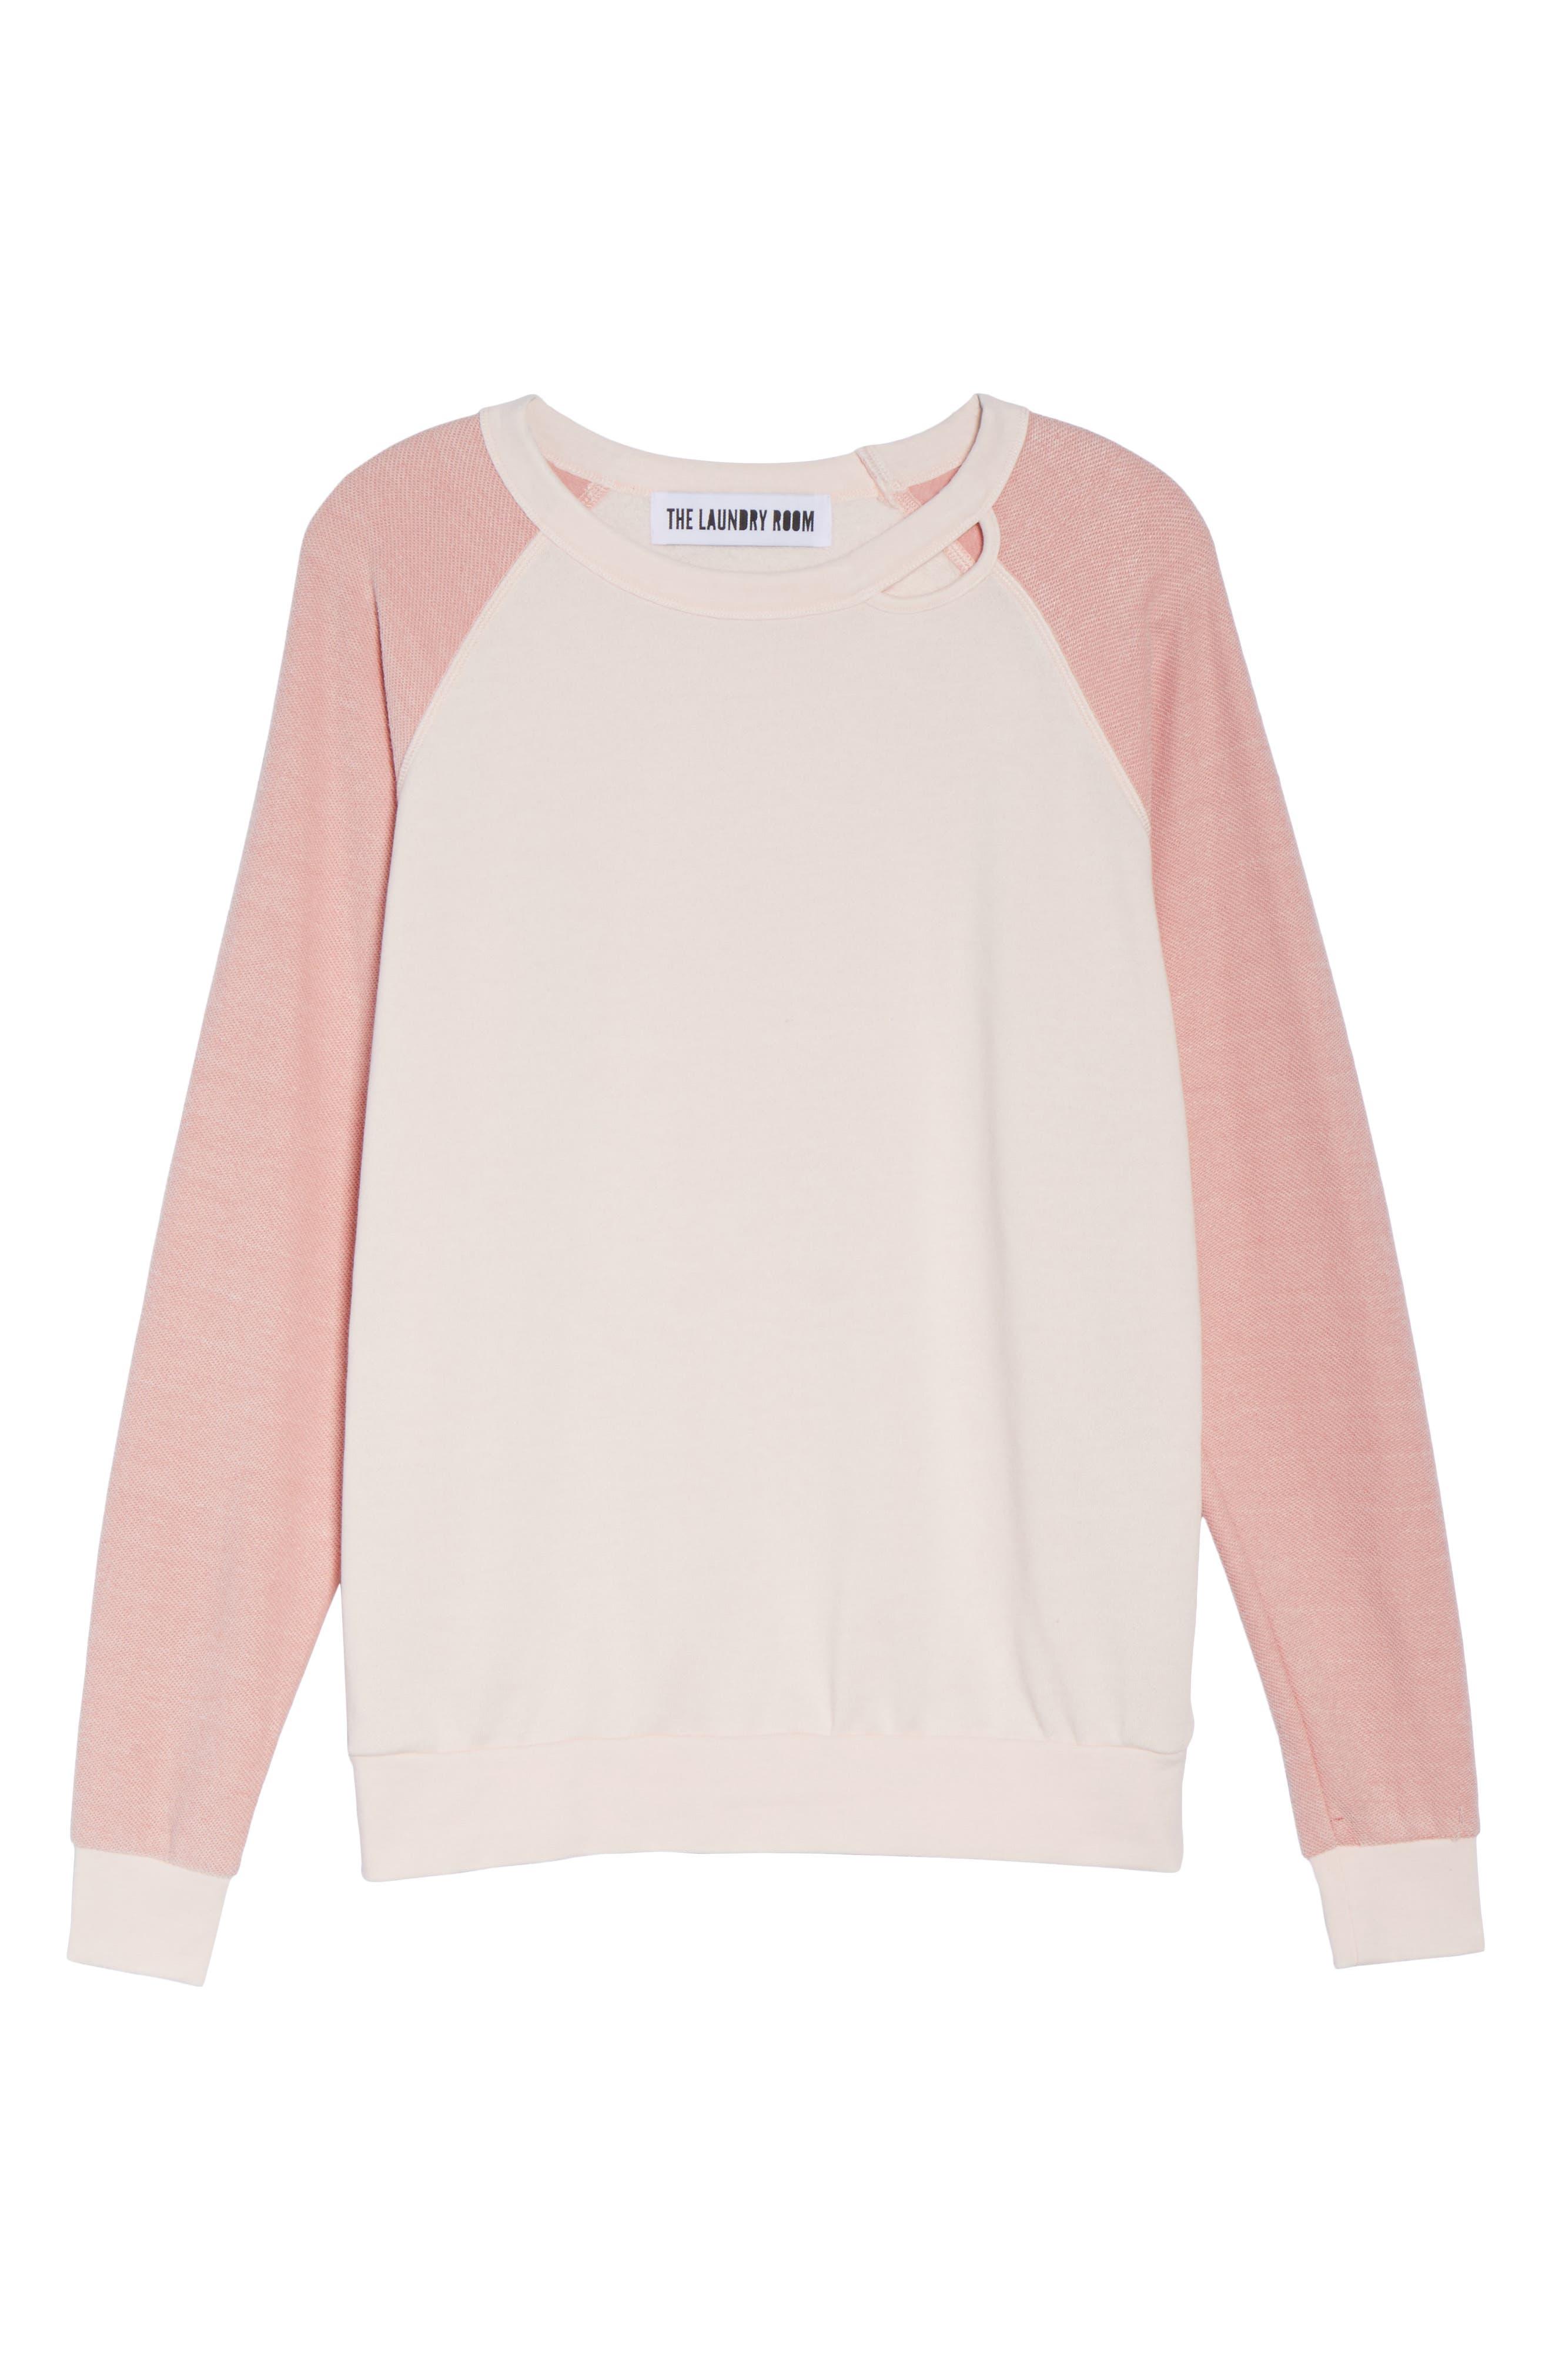 Bander Sweatshirt,                             Alternate thumbnail 4, color,                             Champagne / Shell